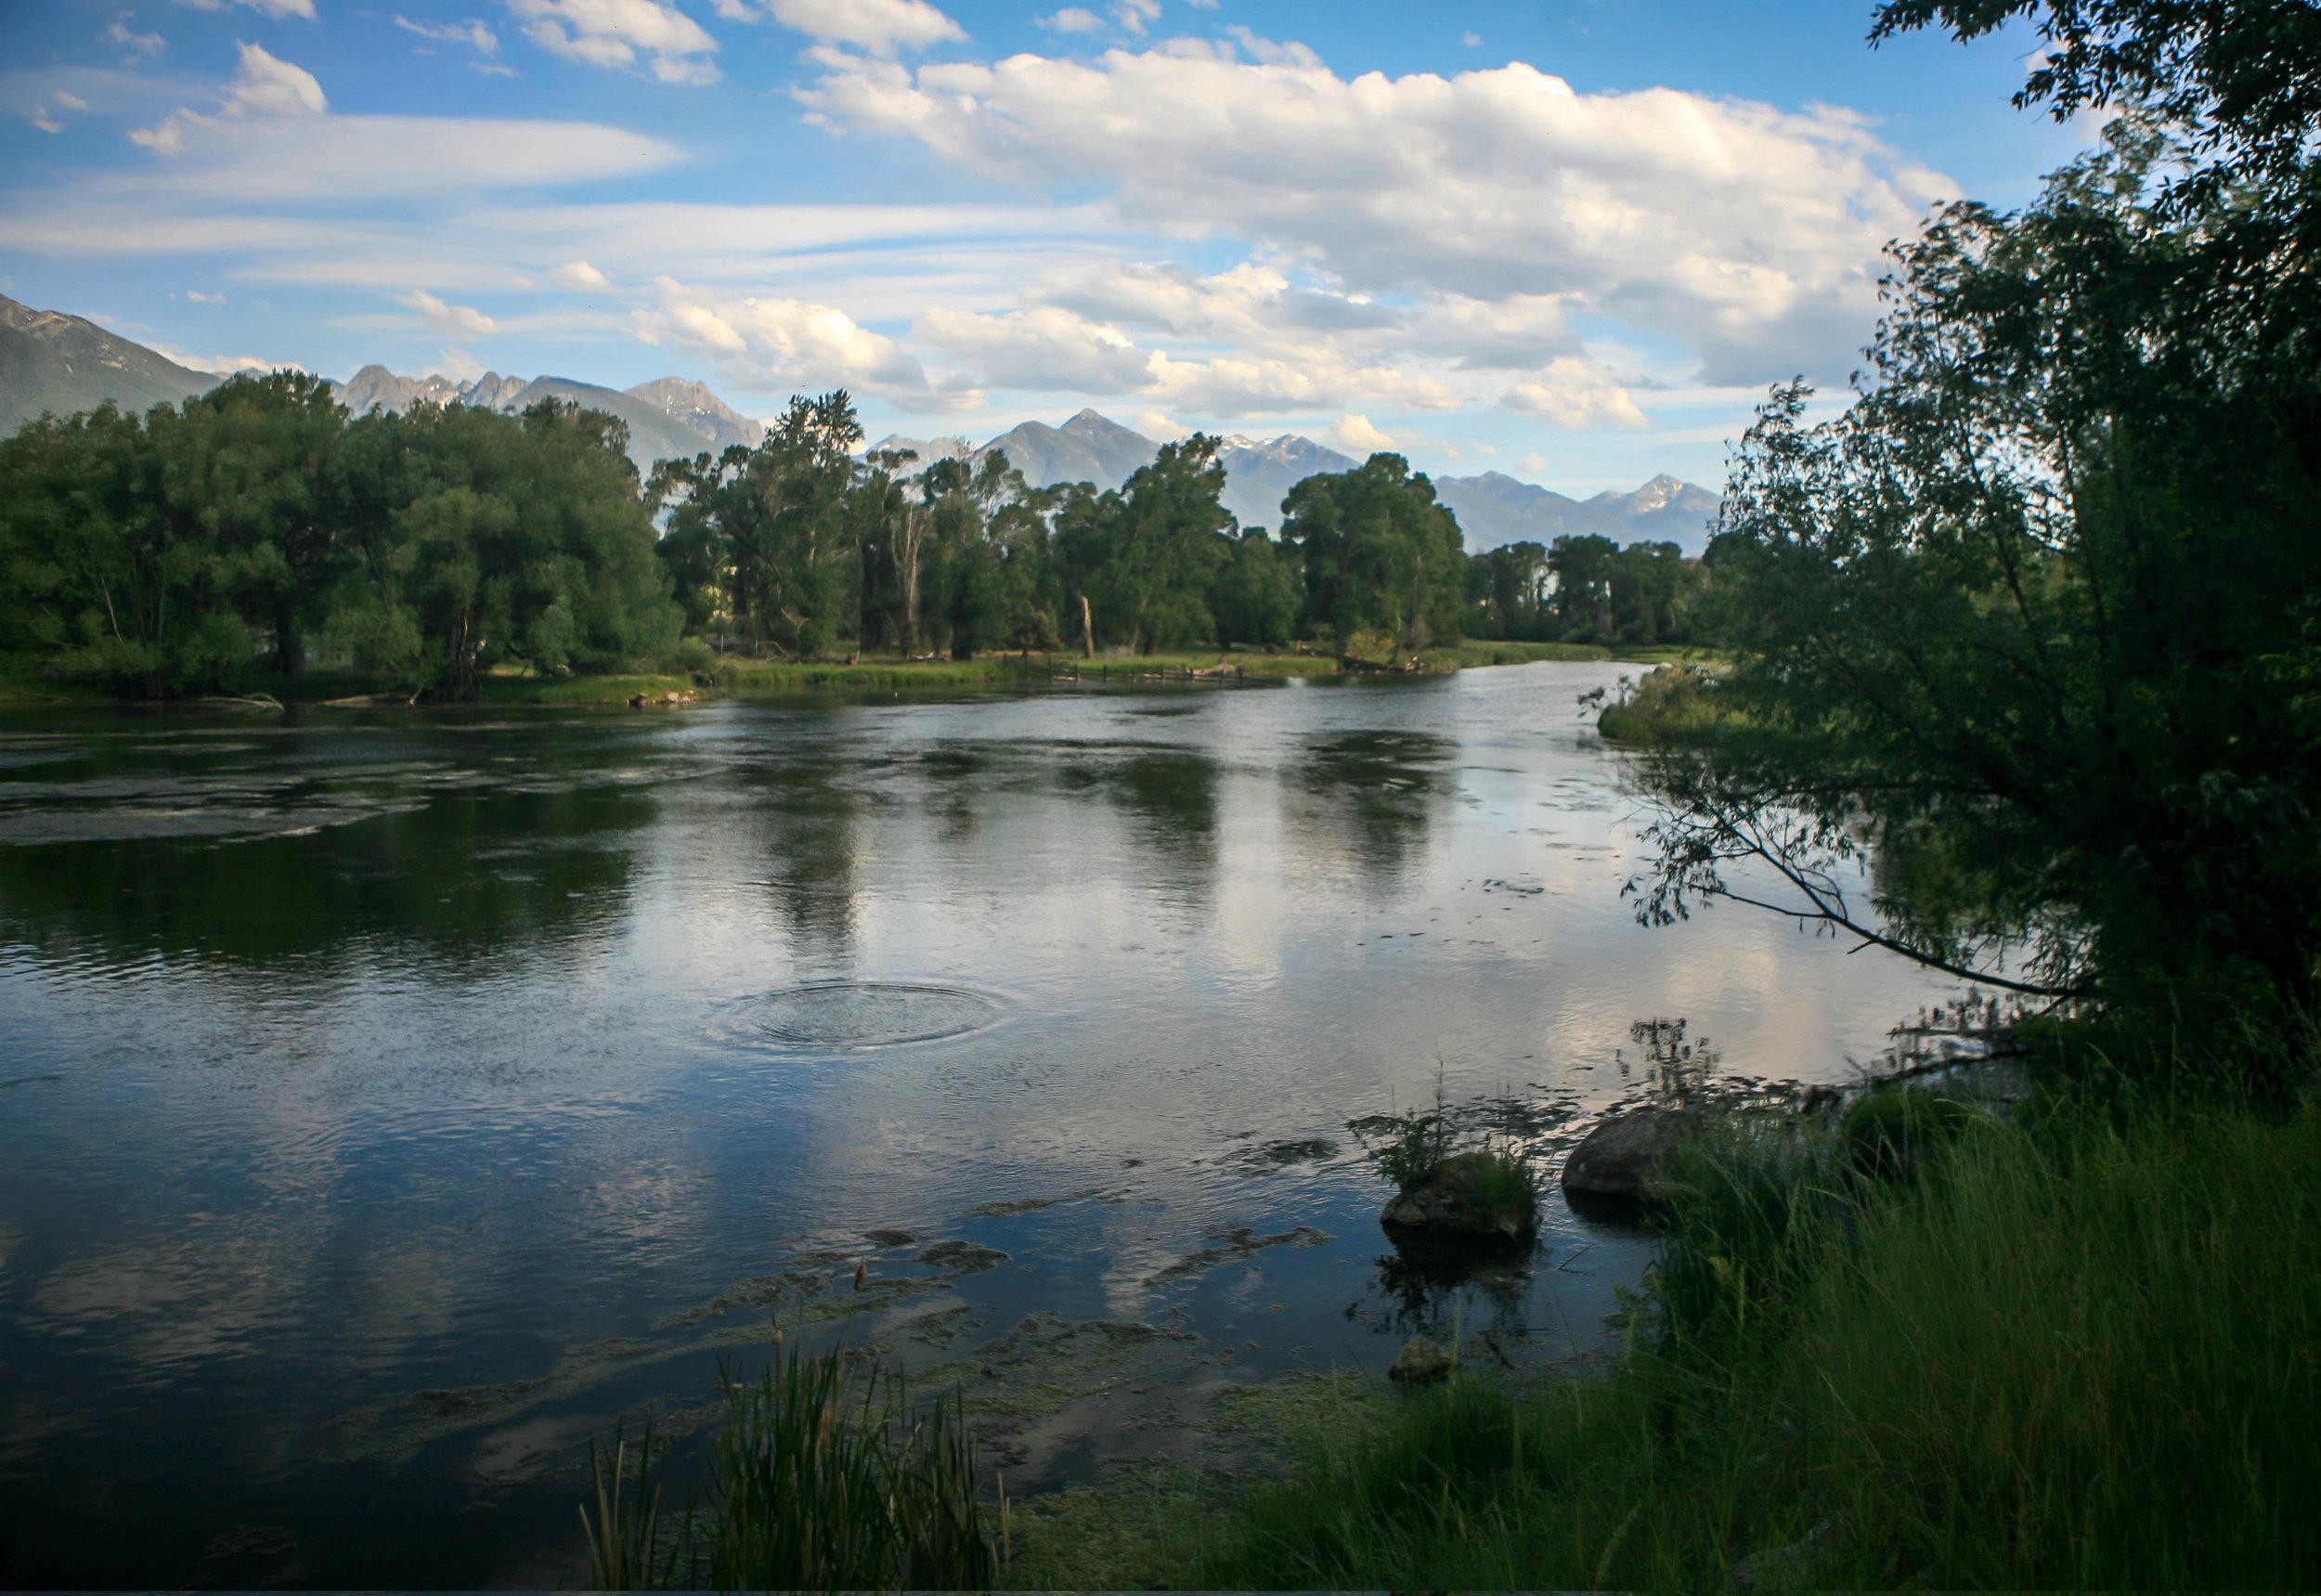 Depuys Spring Creek, Paradise Valley, Livingston, Montana.